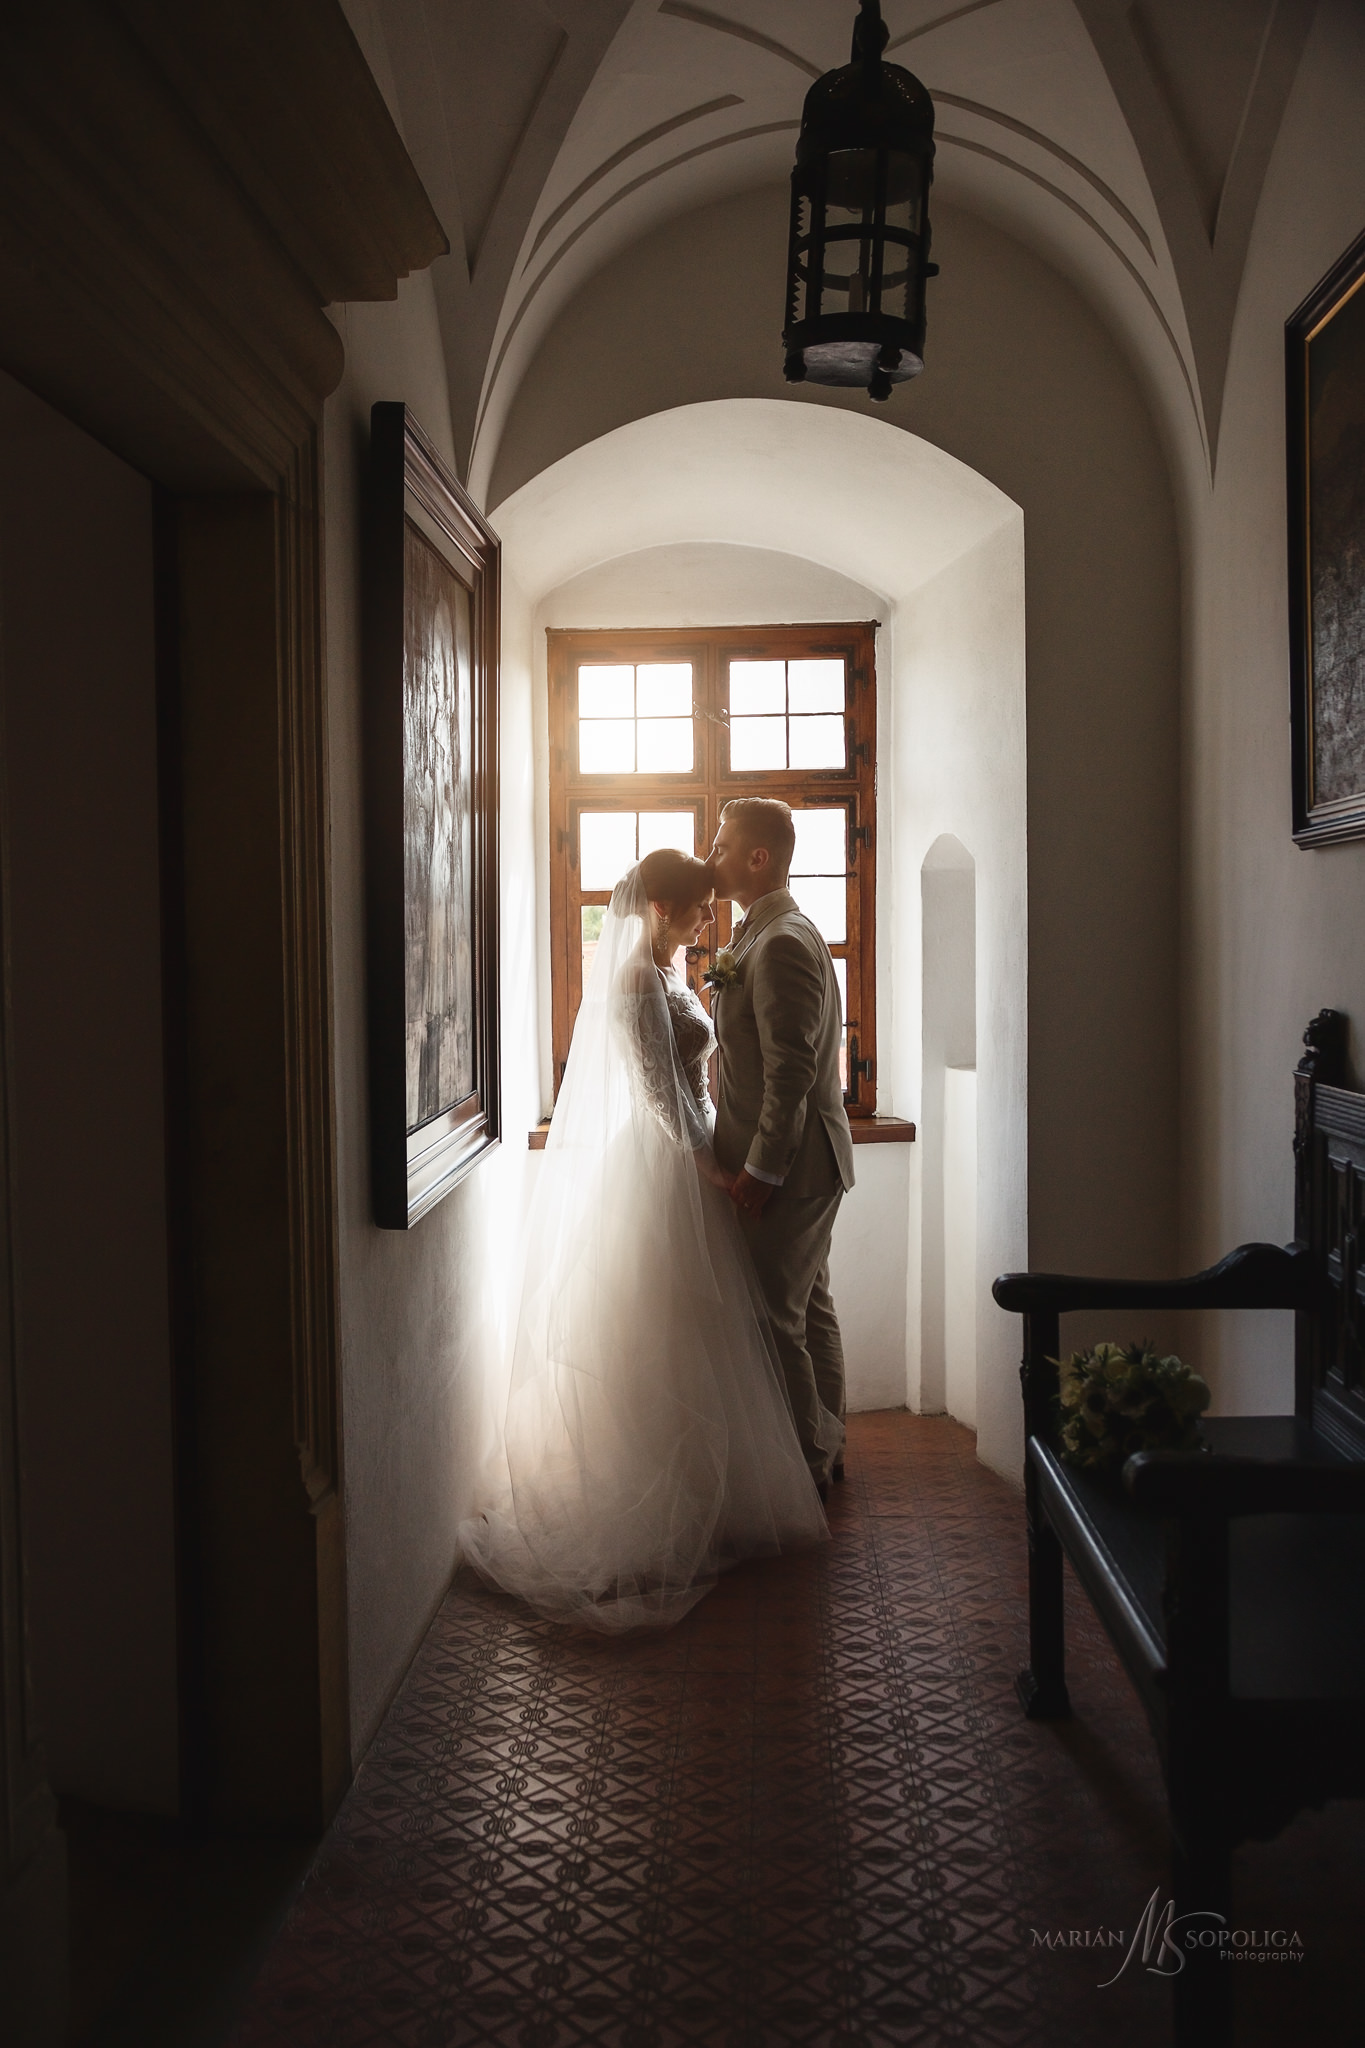 36portretni-svatebni-fotky-novomazelu-v-interieru-statniho-hradu